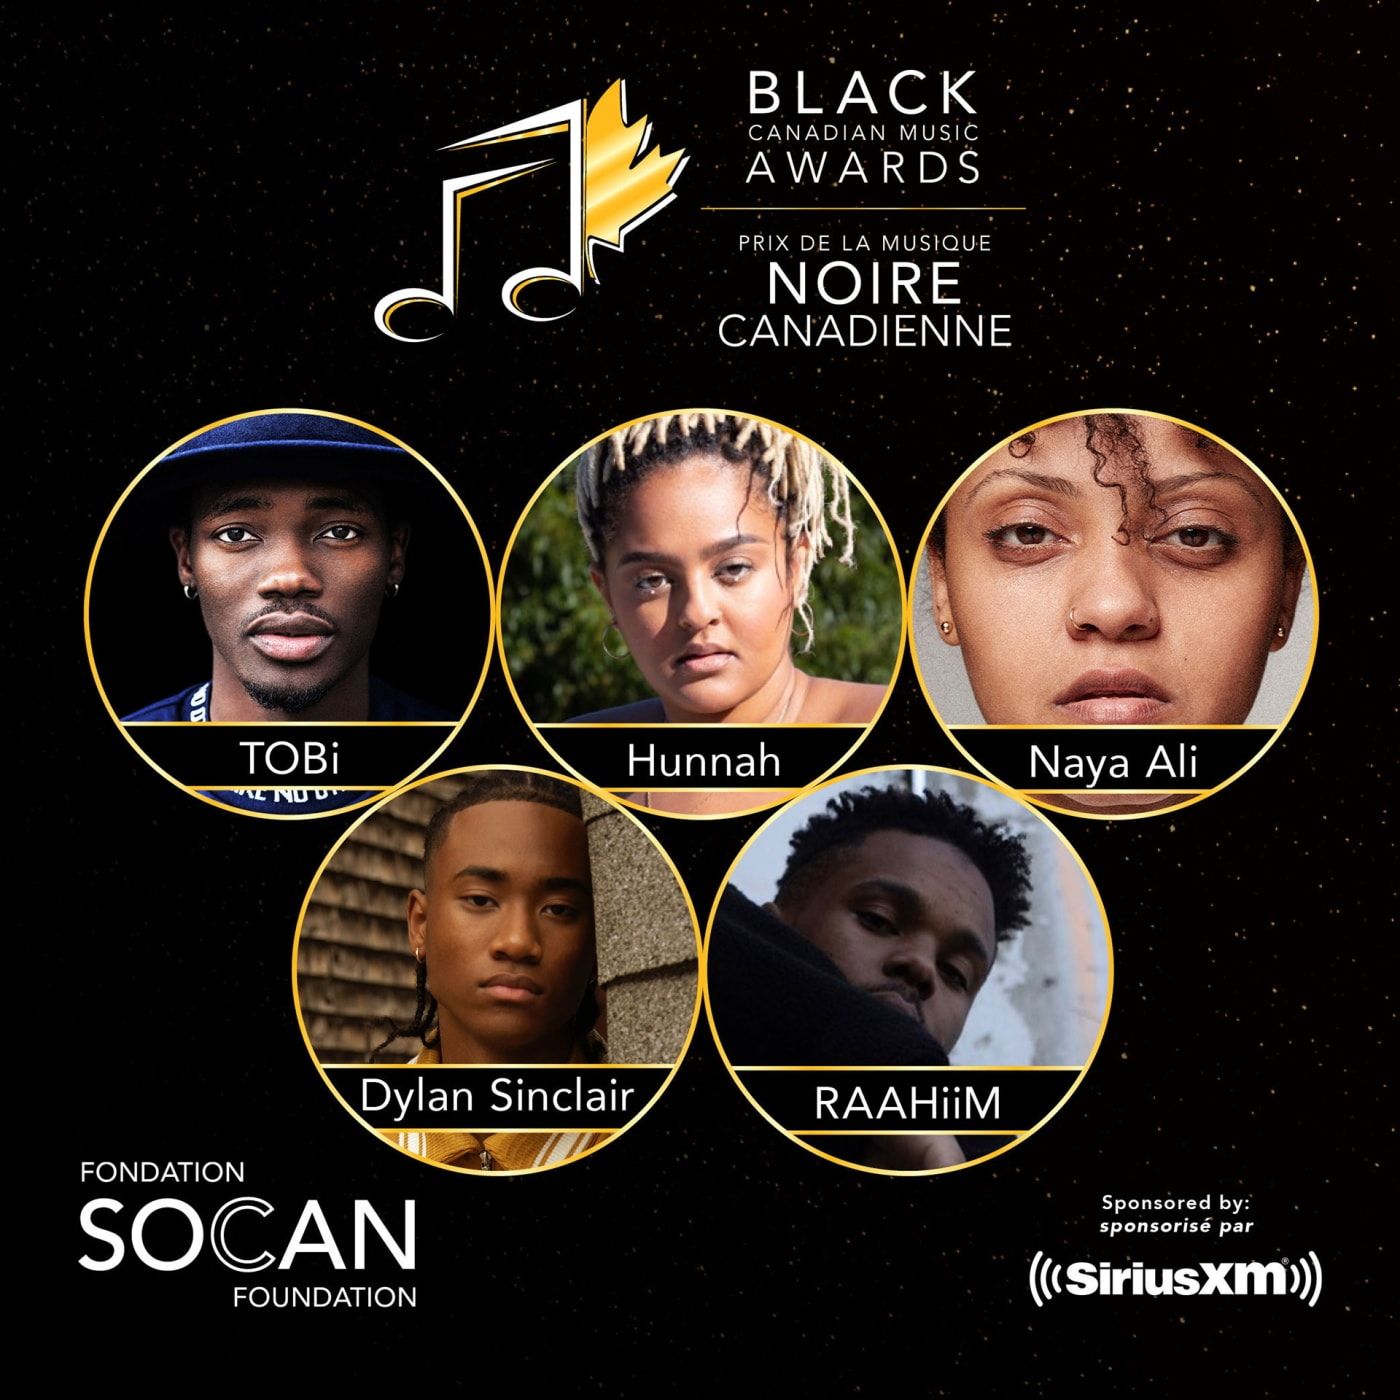 black canadian music awards